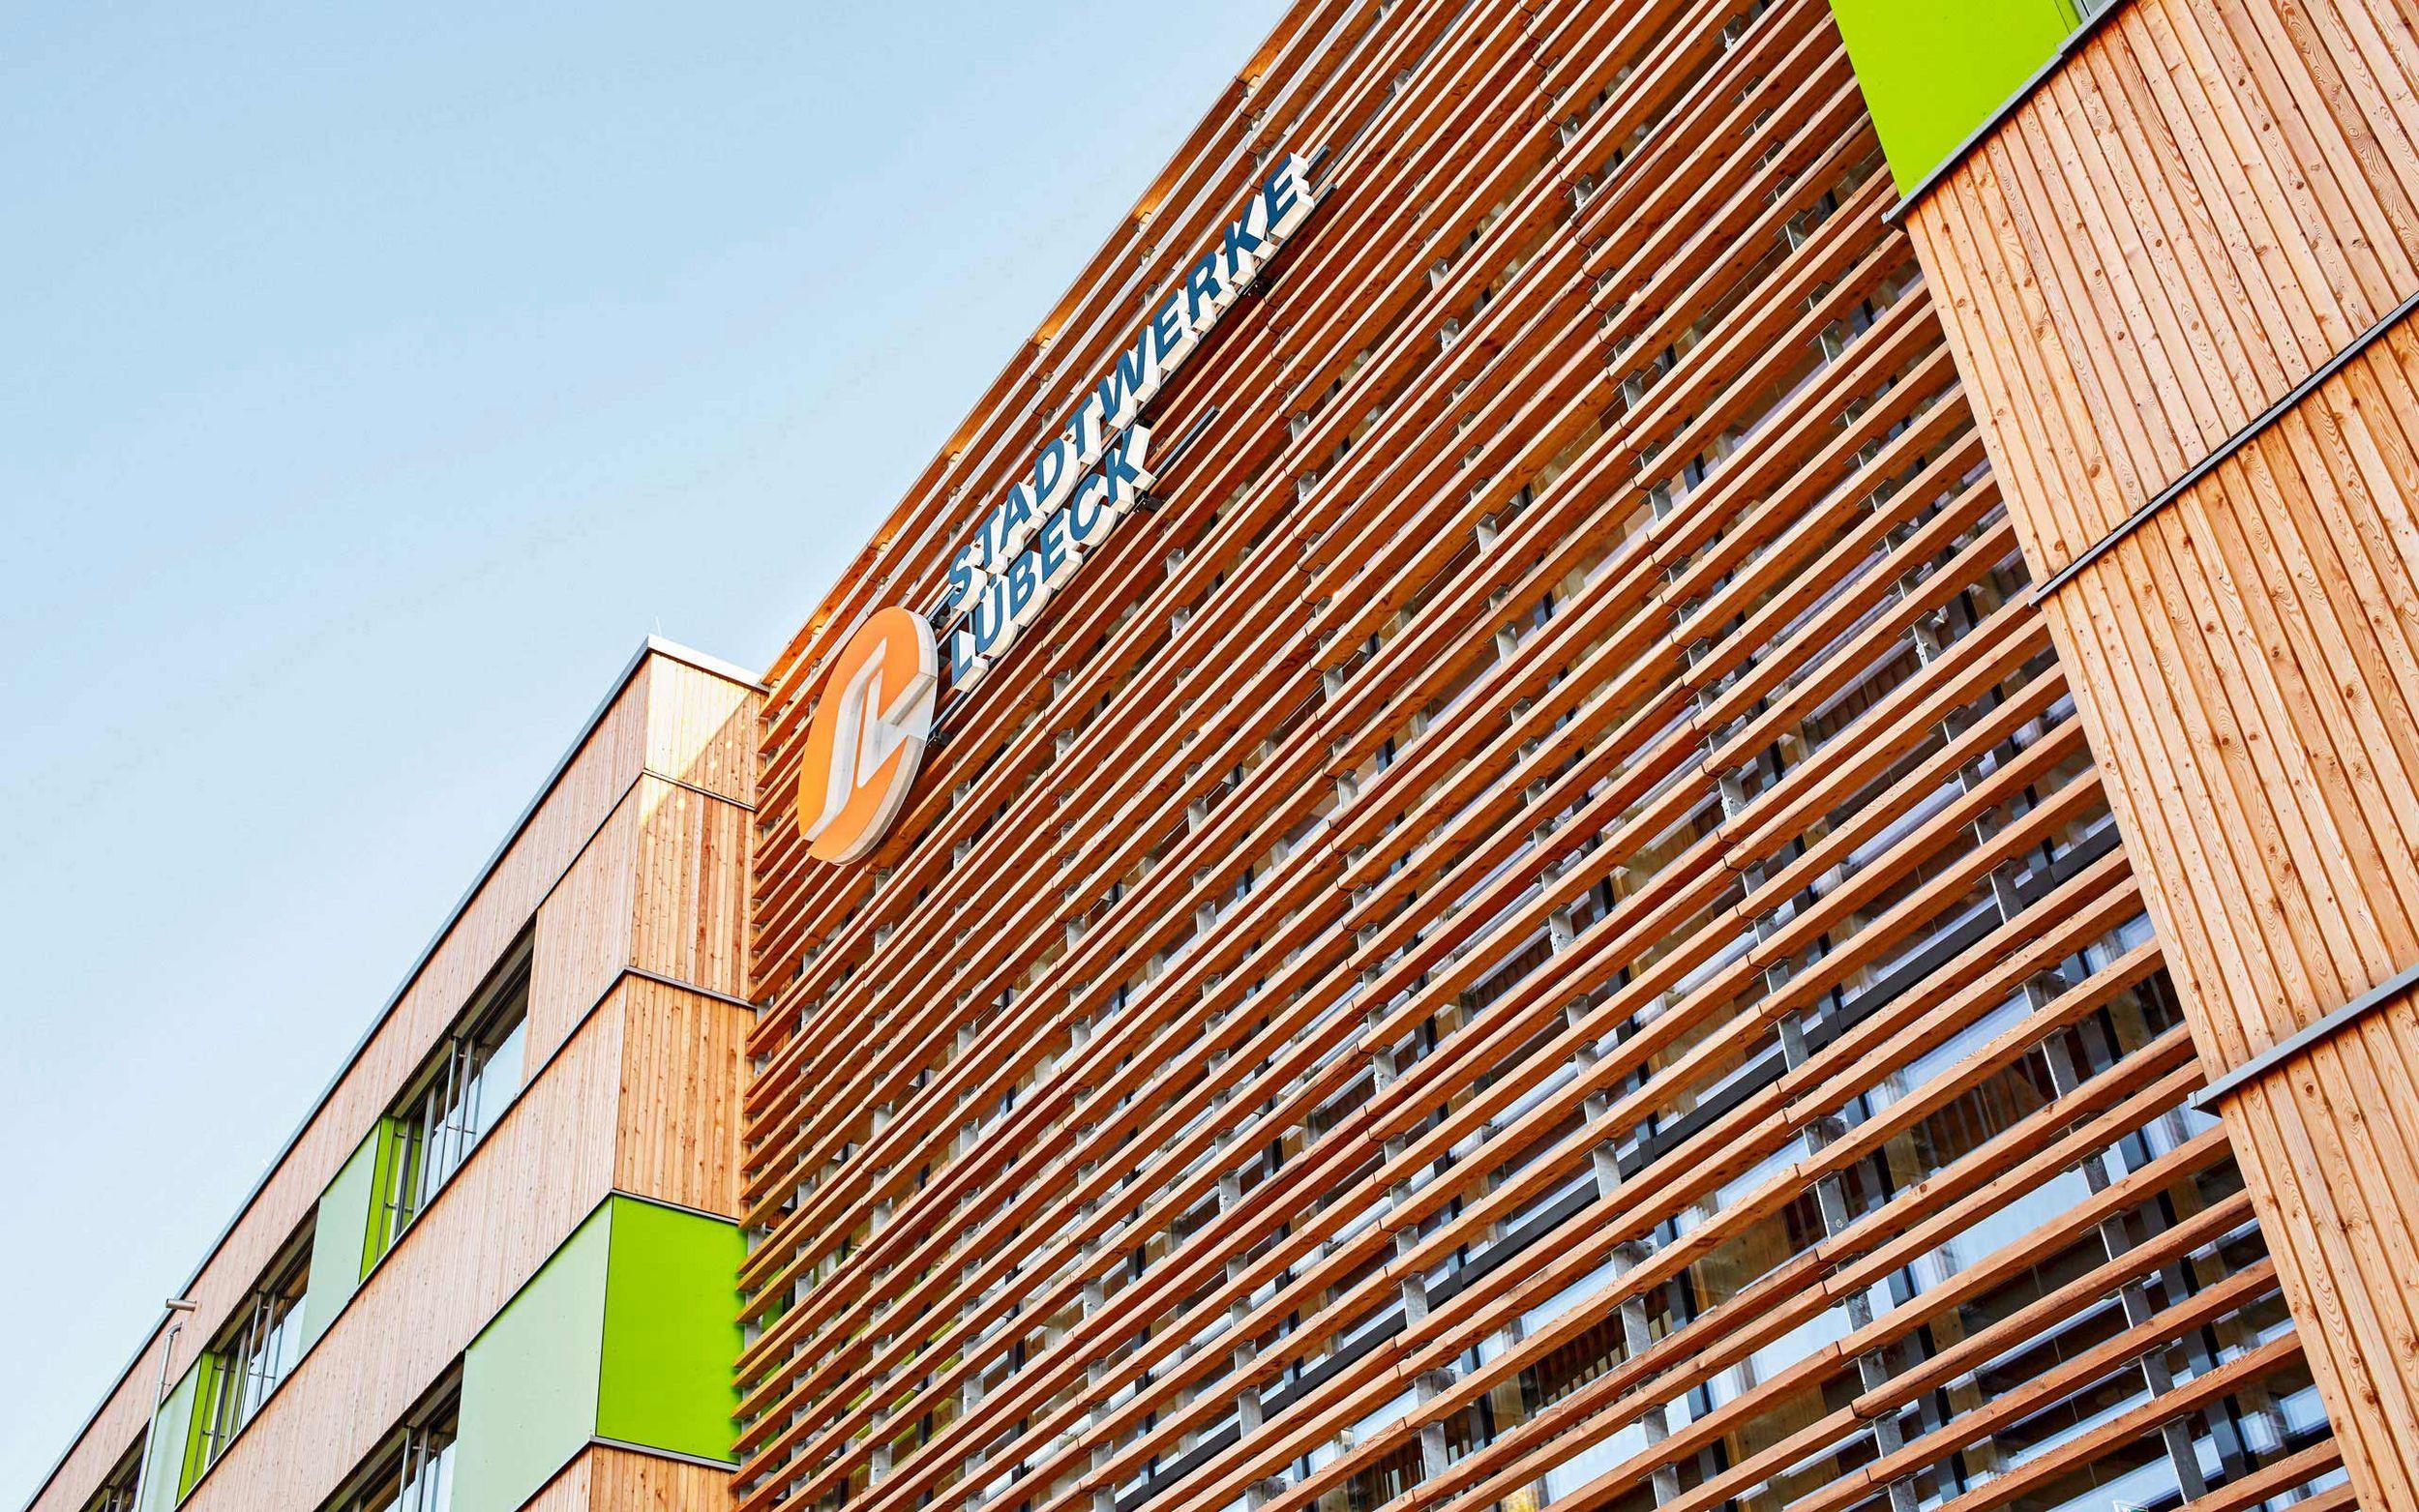 Holzlamellenfassade Konstruktion stadtwerke luebeck